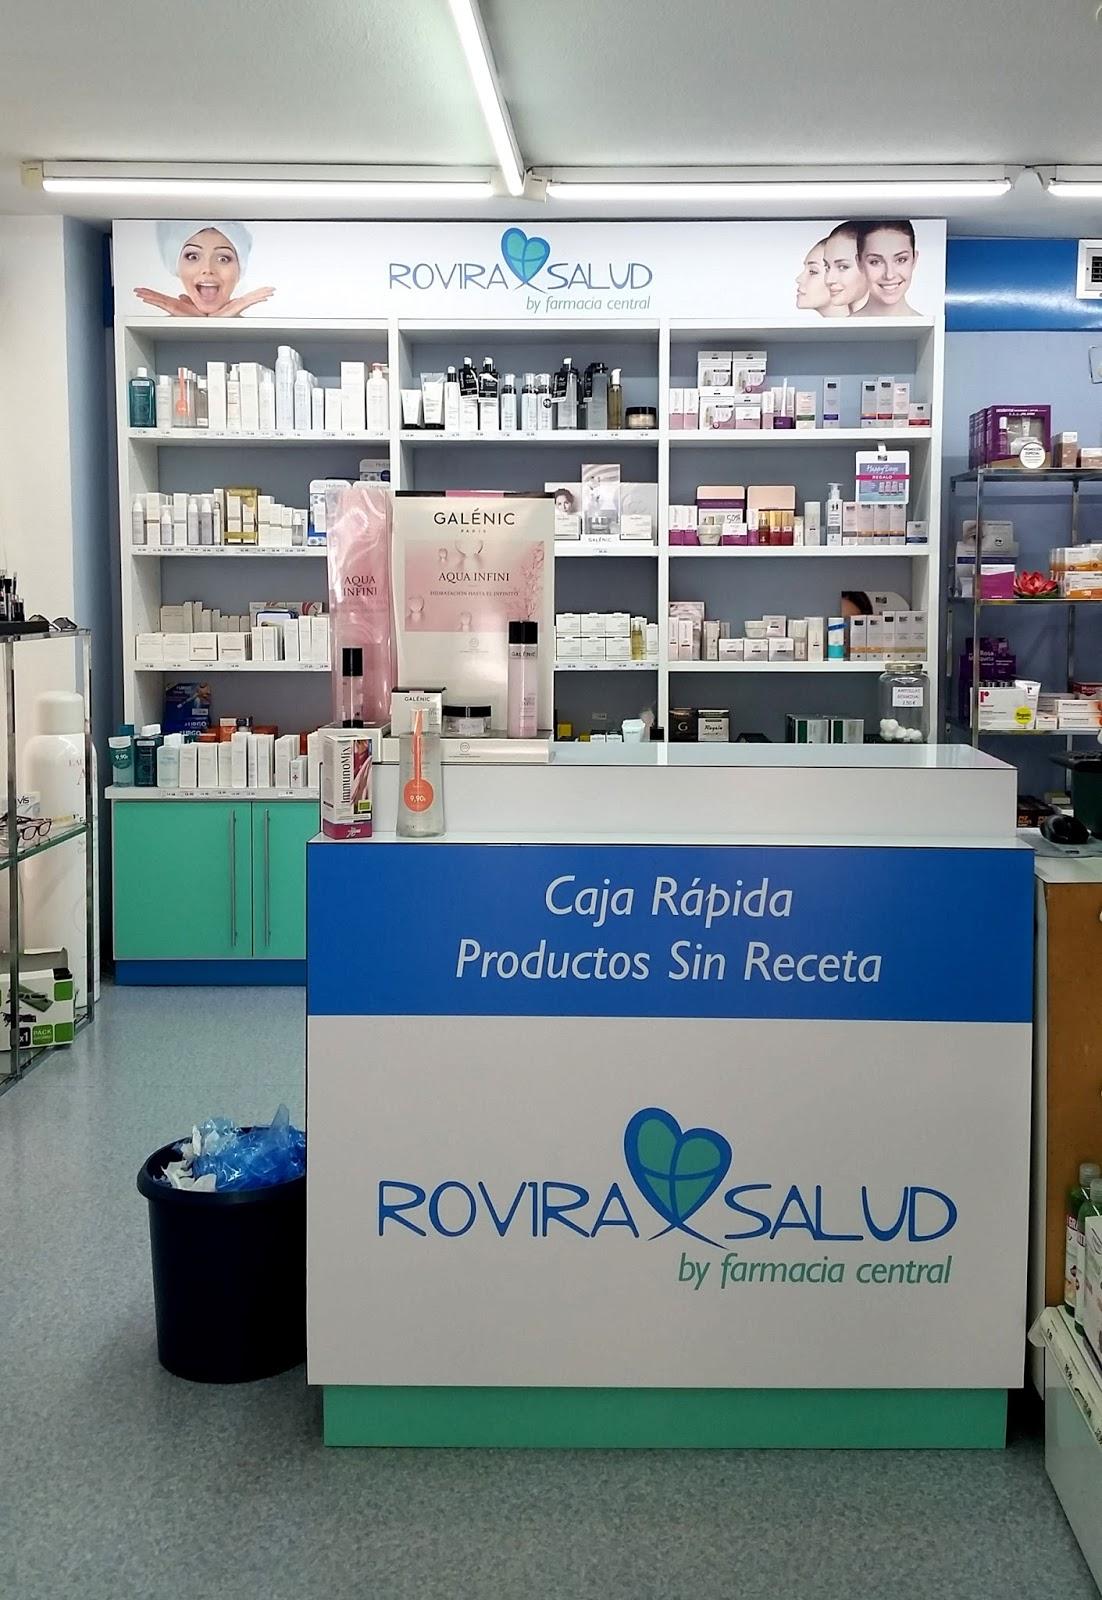 Dekotipo Design Rovira Salud En Farmacia Central Ontinyent